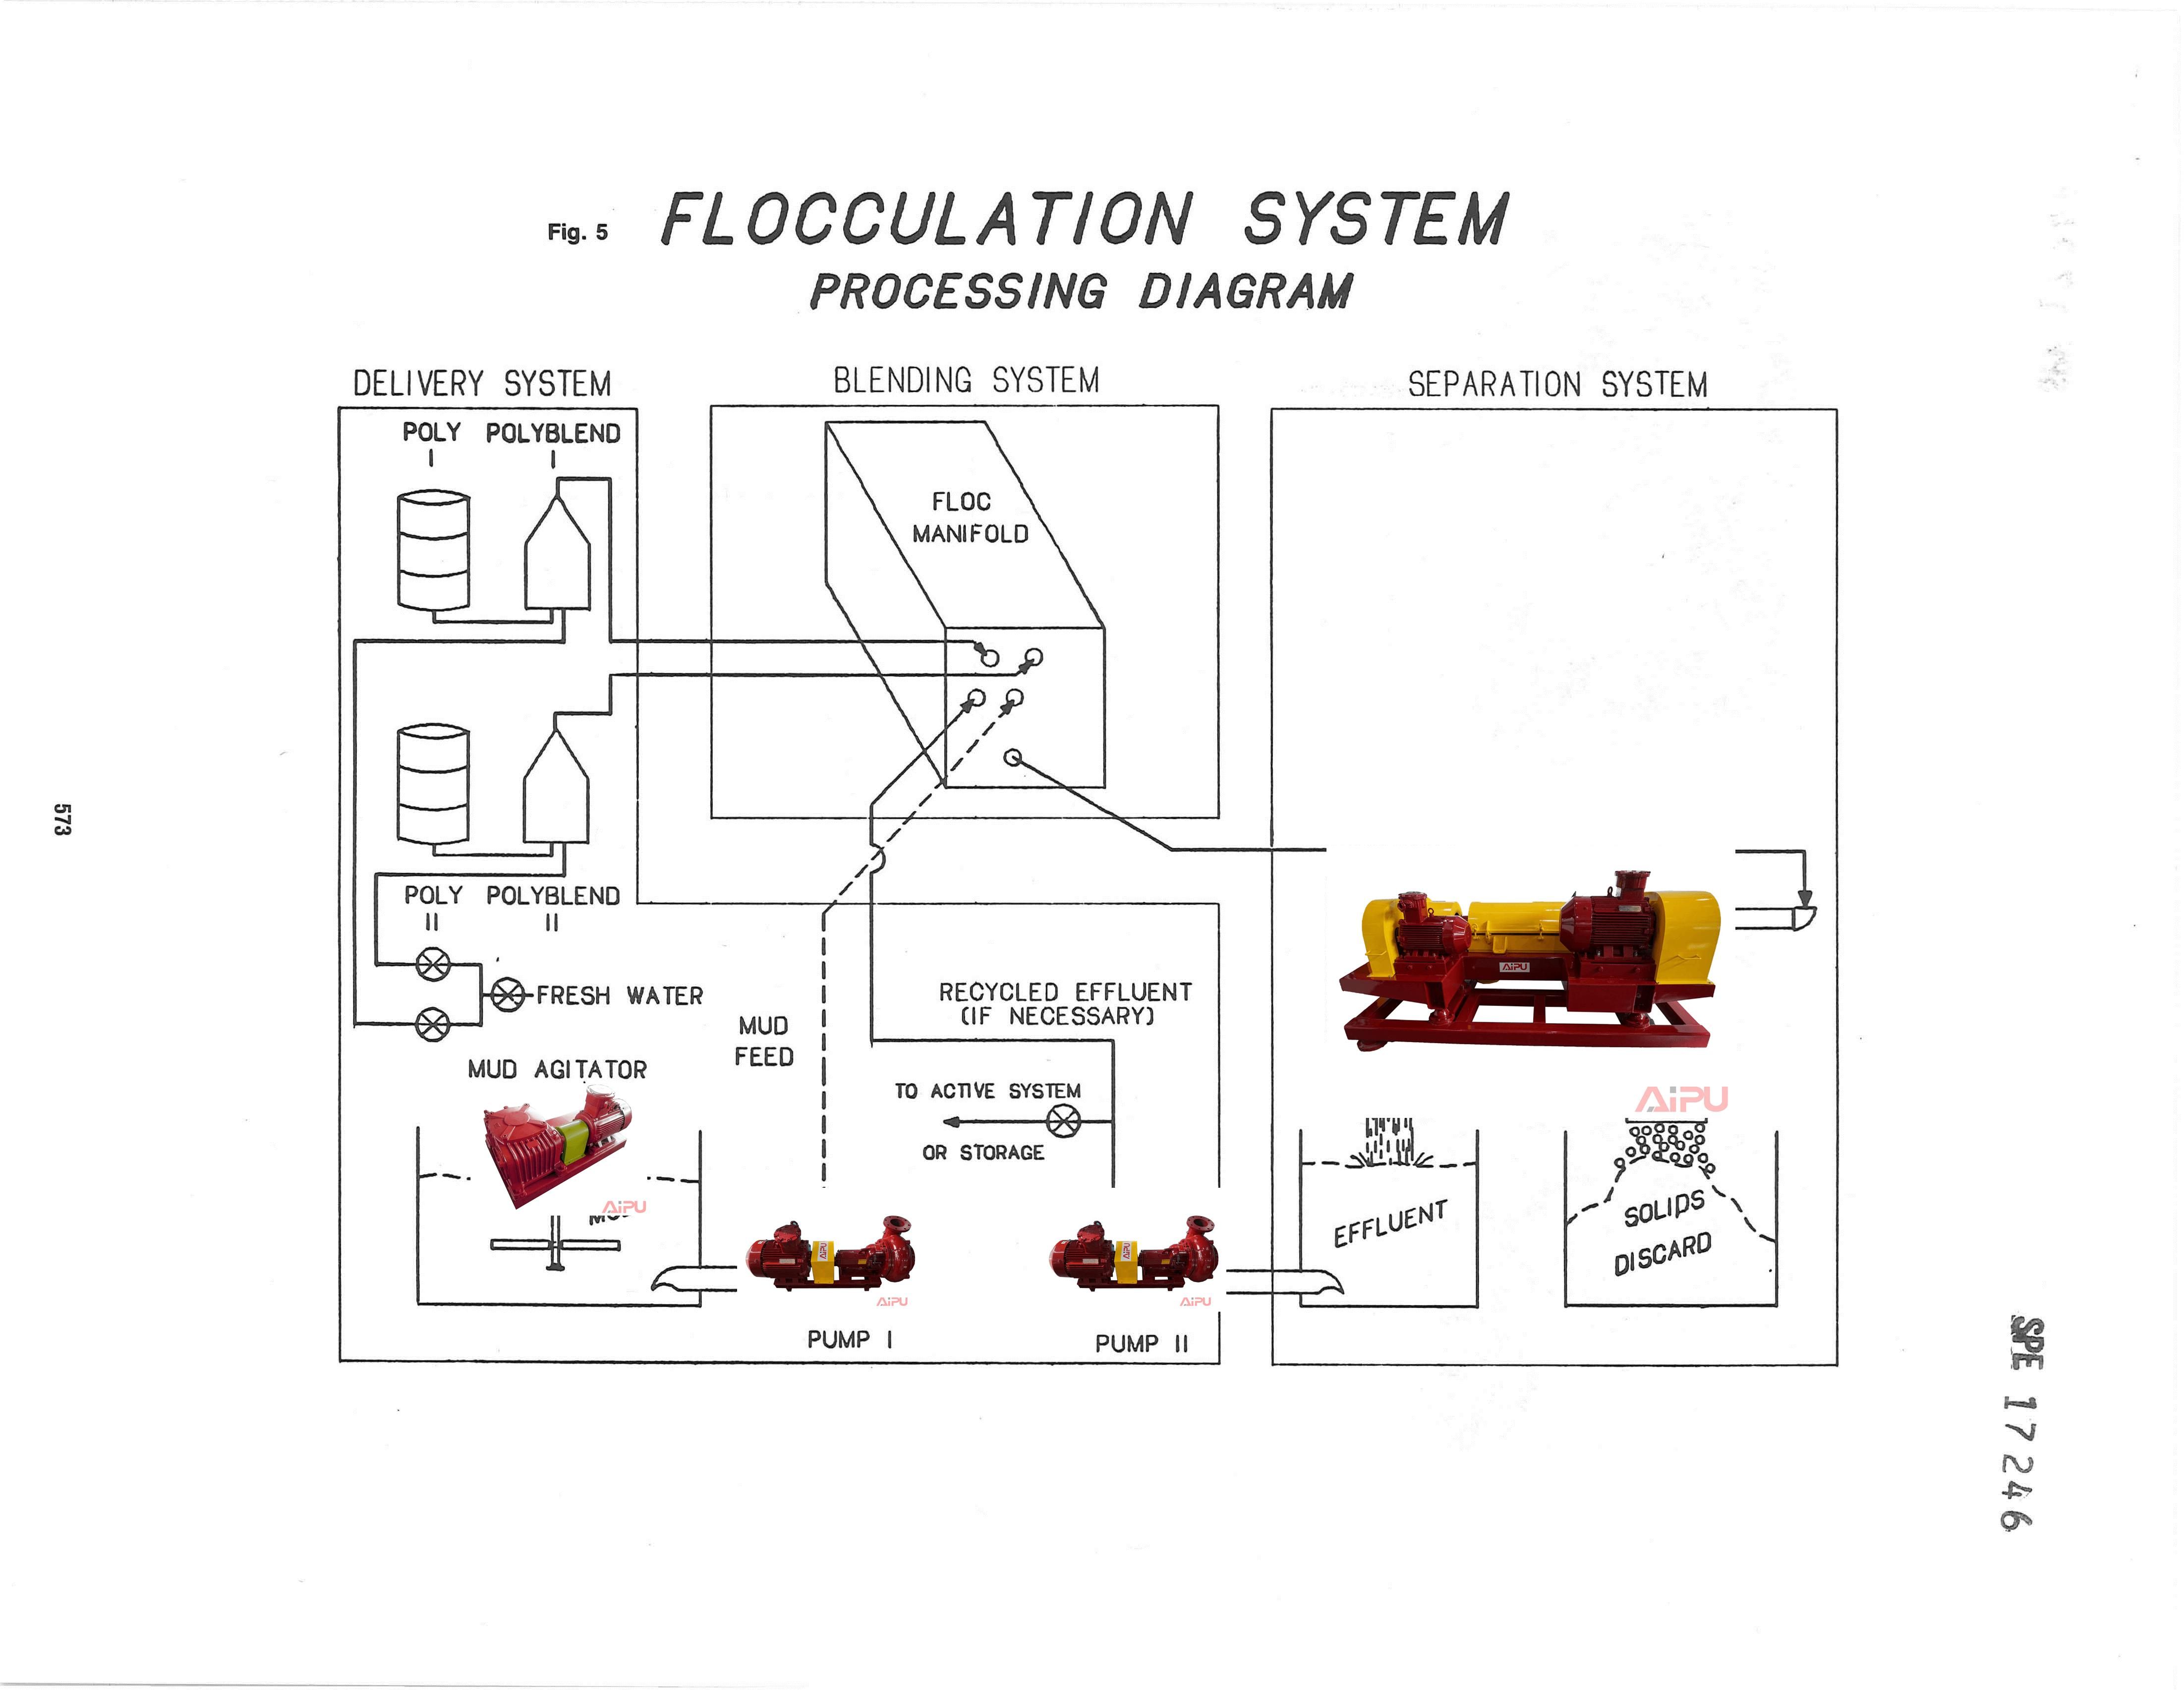 FLOCCULATION SYSTEM